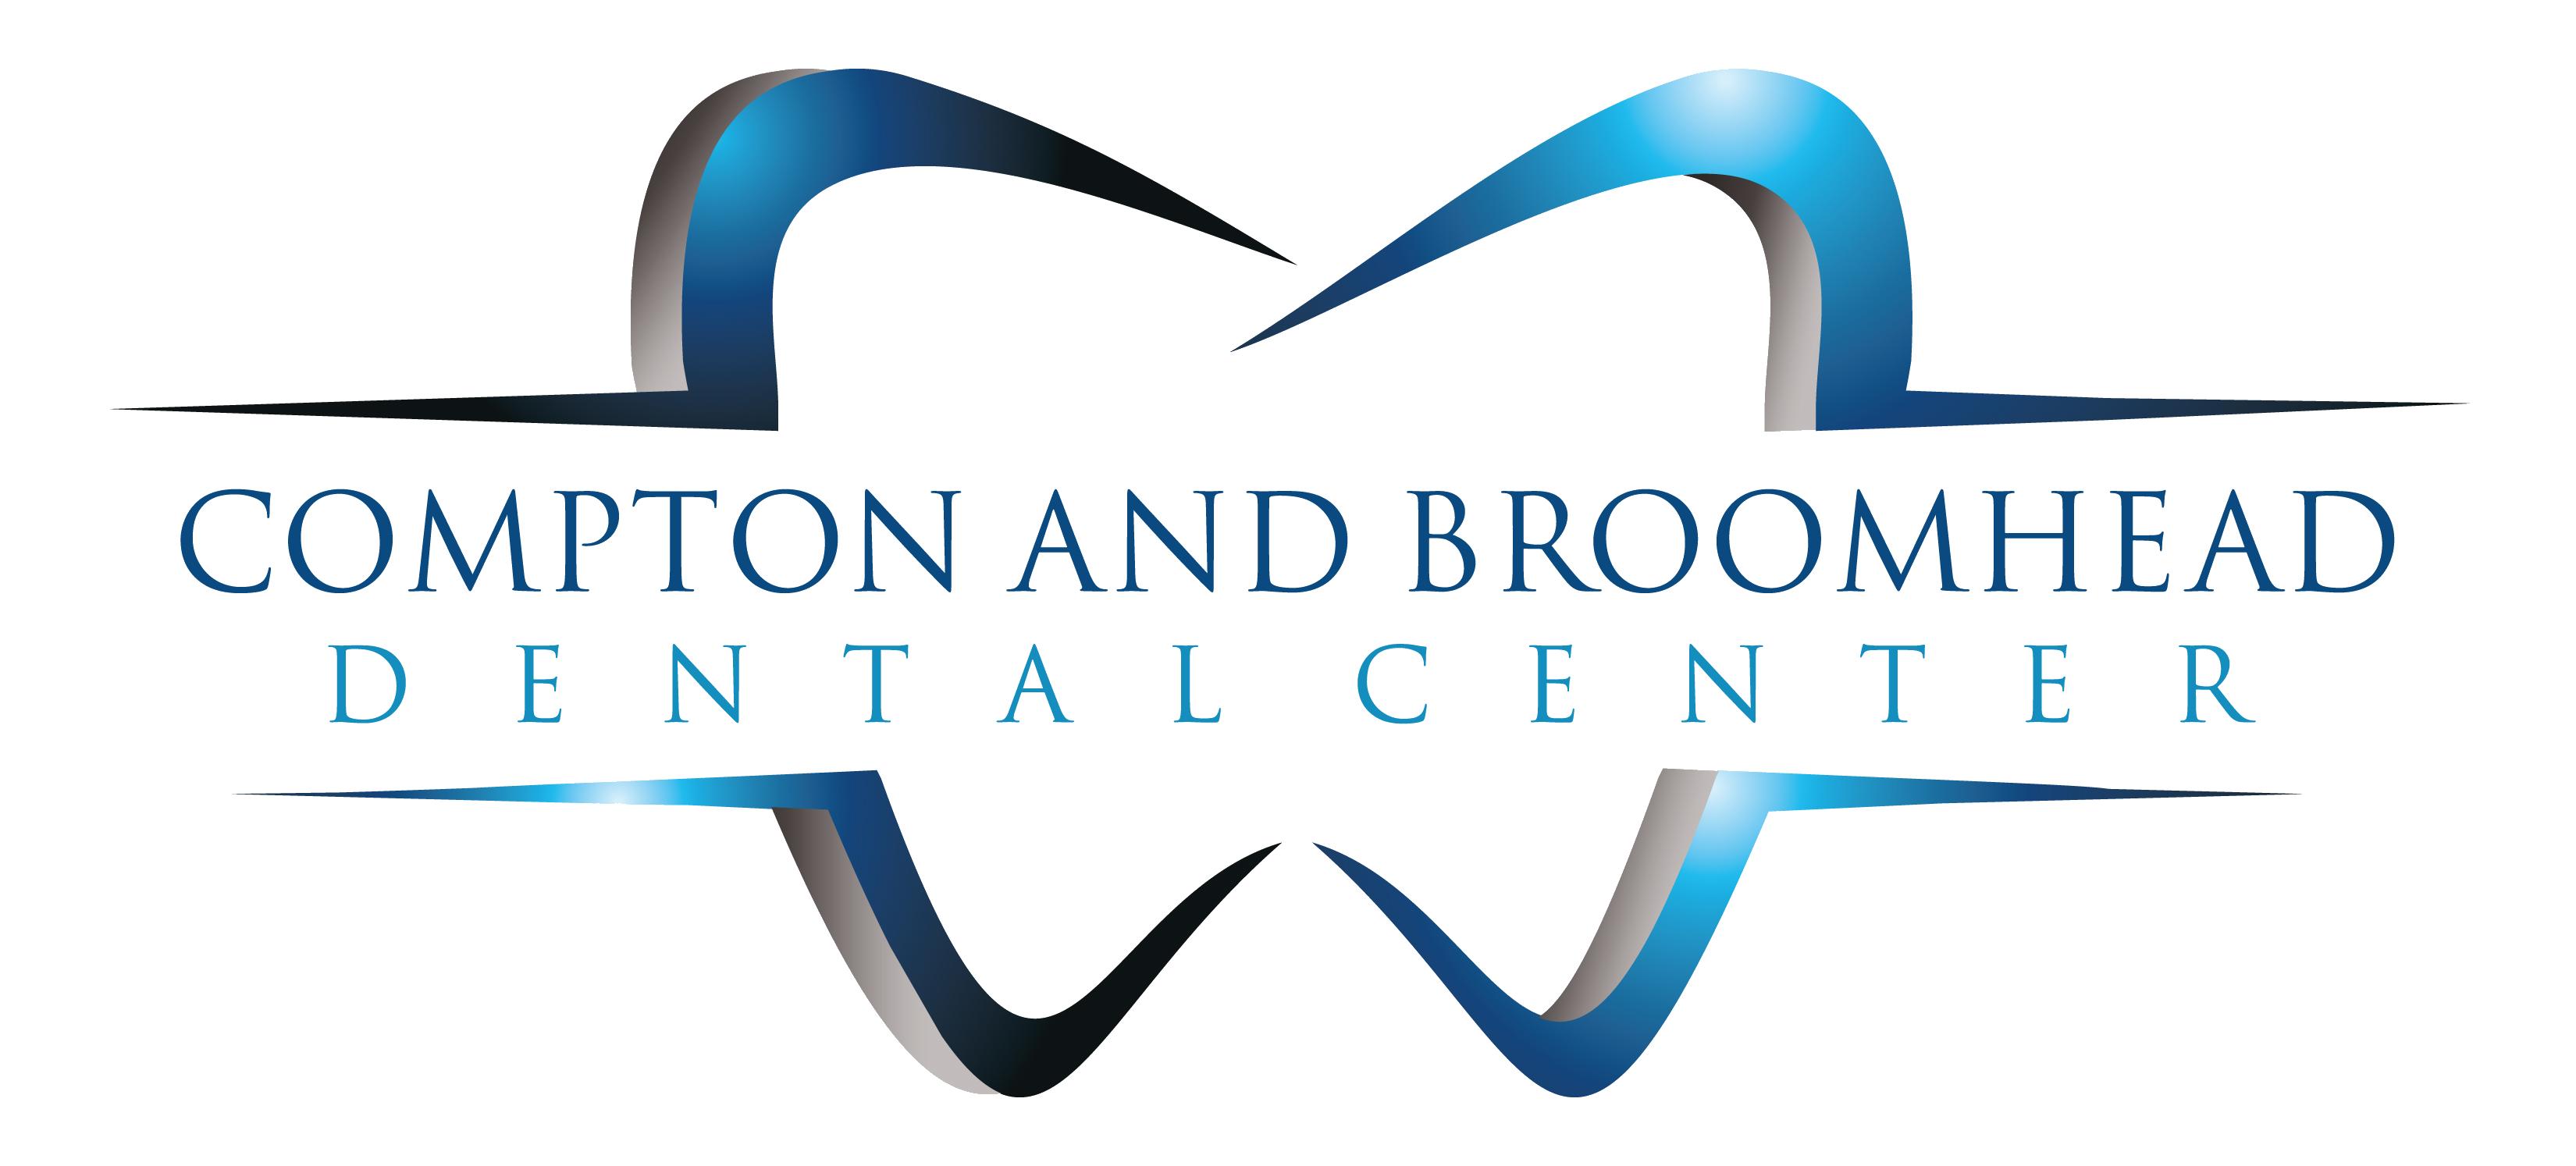 Compton and Broomhead Dental